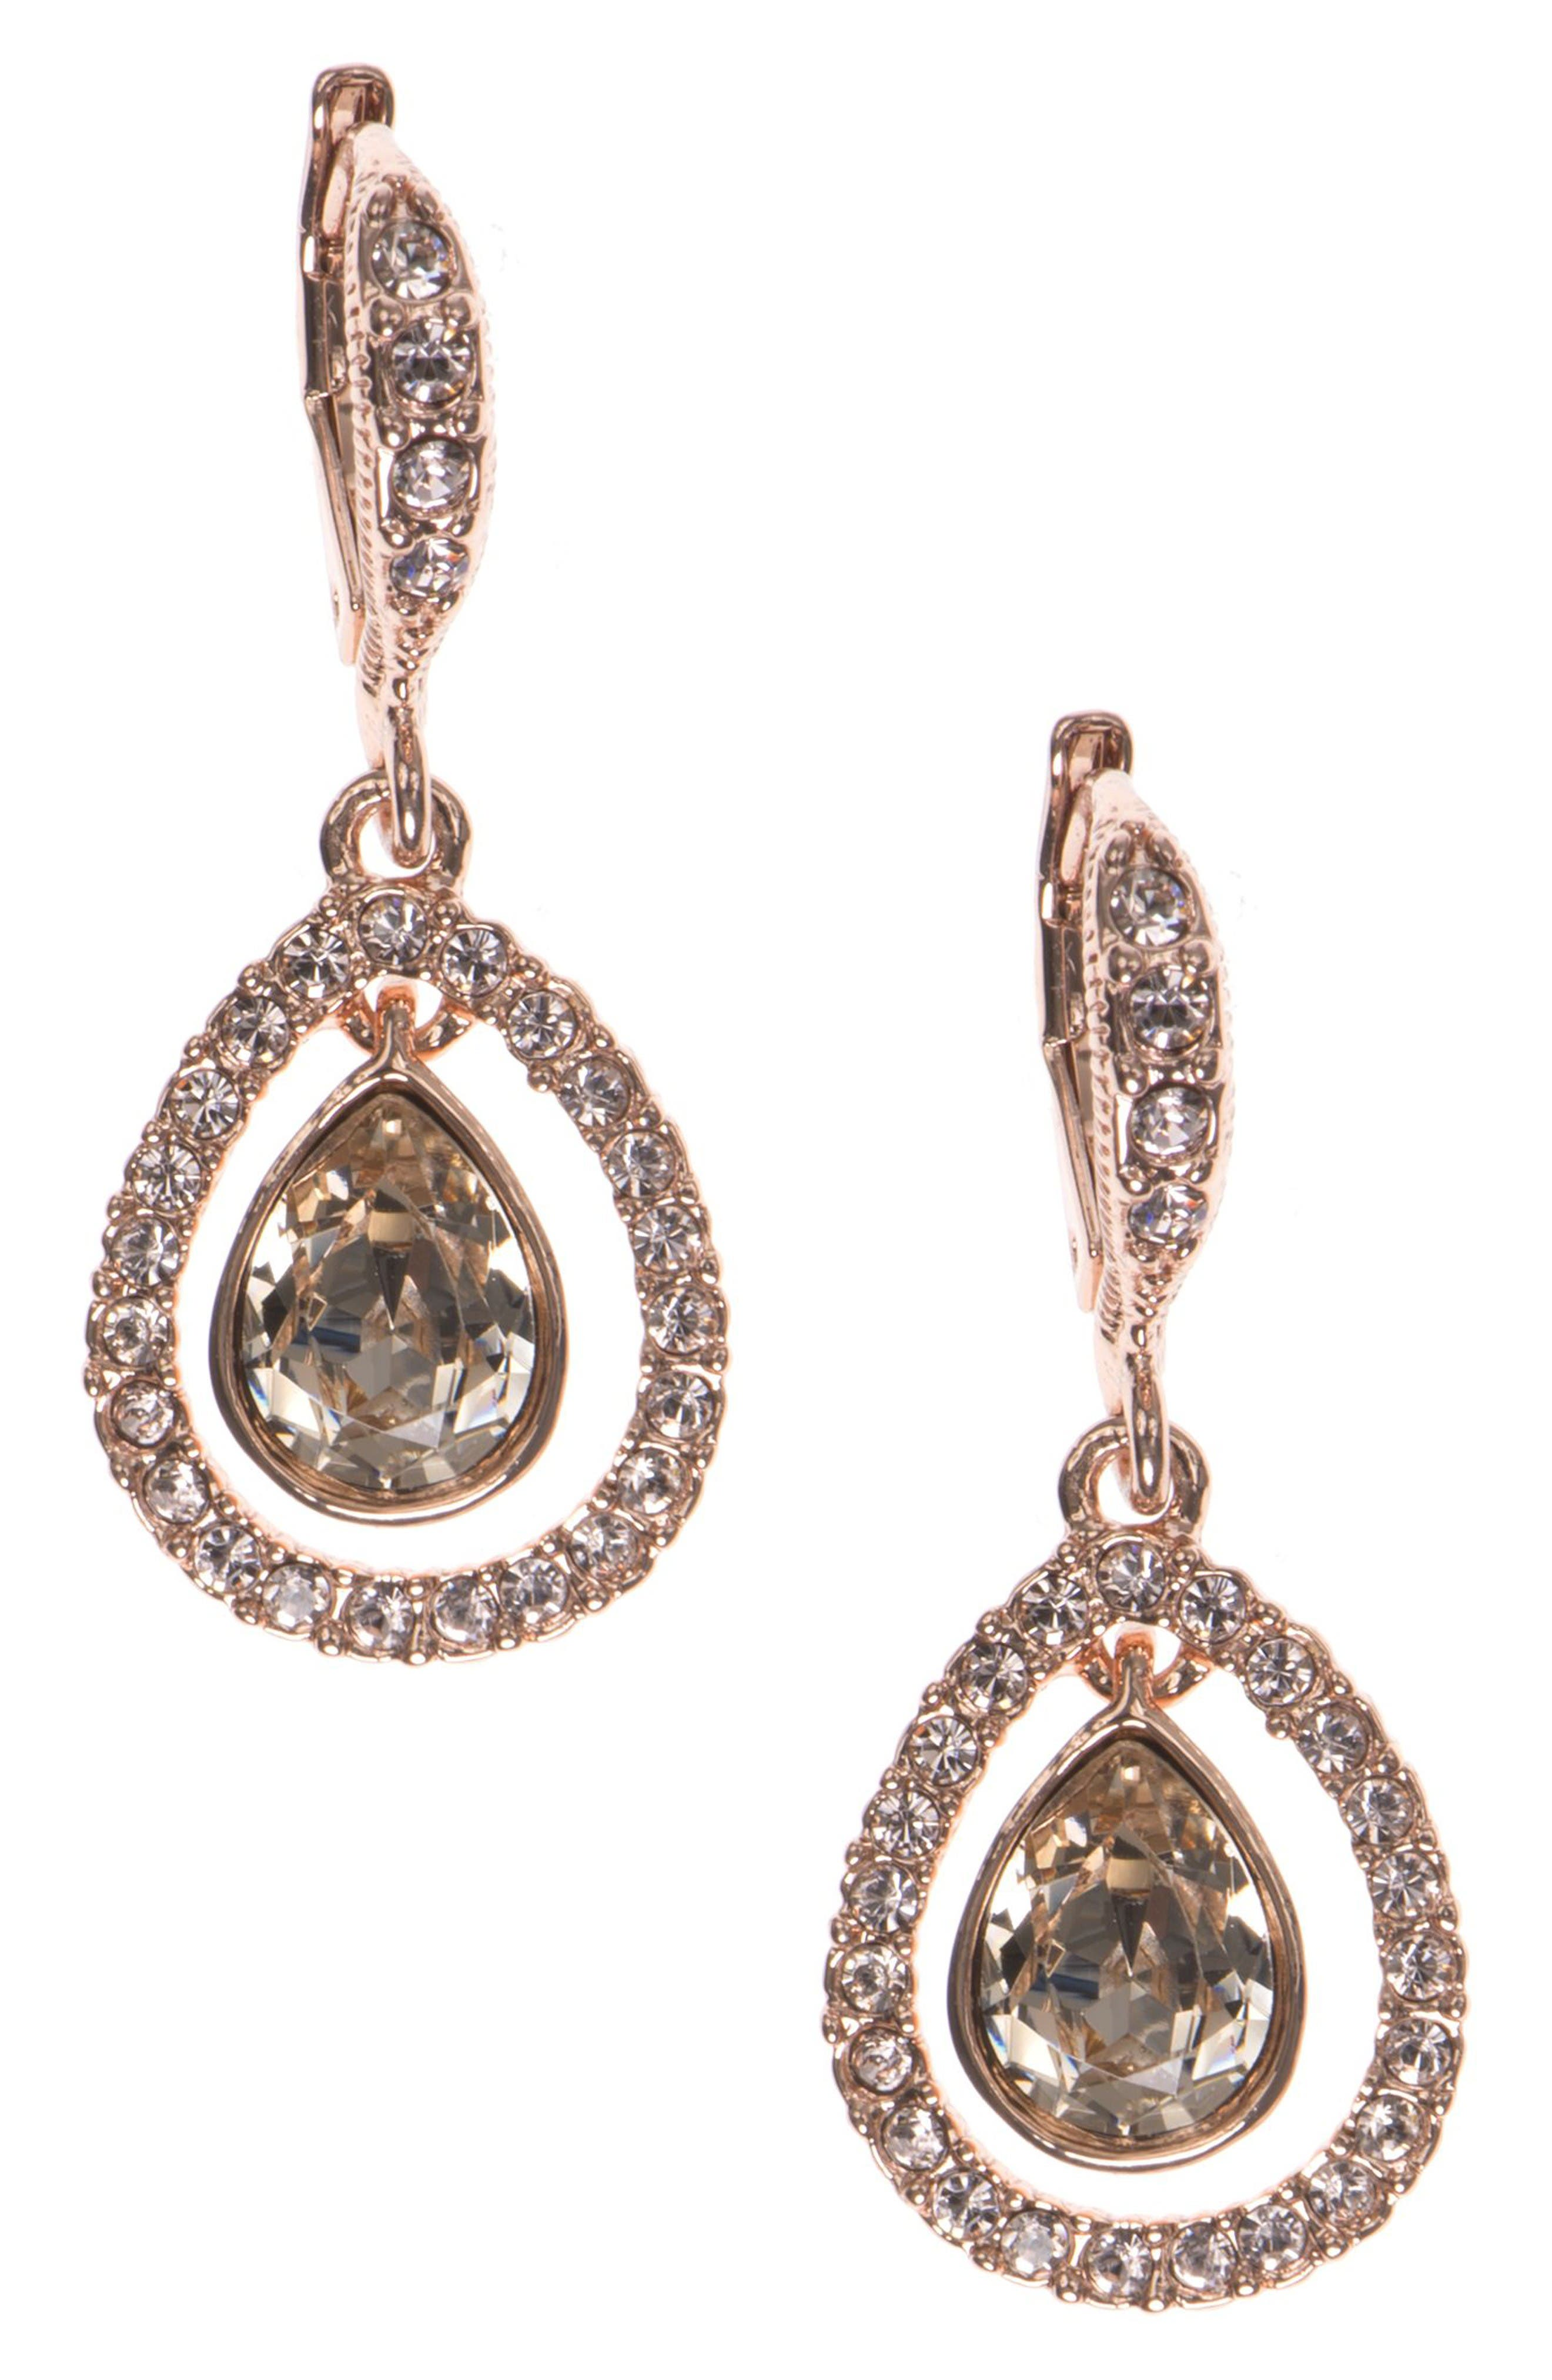 Main Image - Givenchy Crystal Drop Earrings